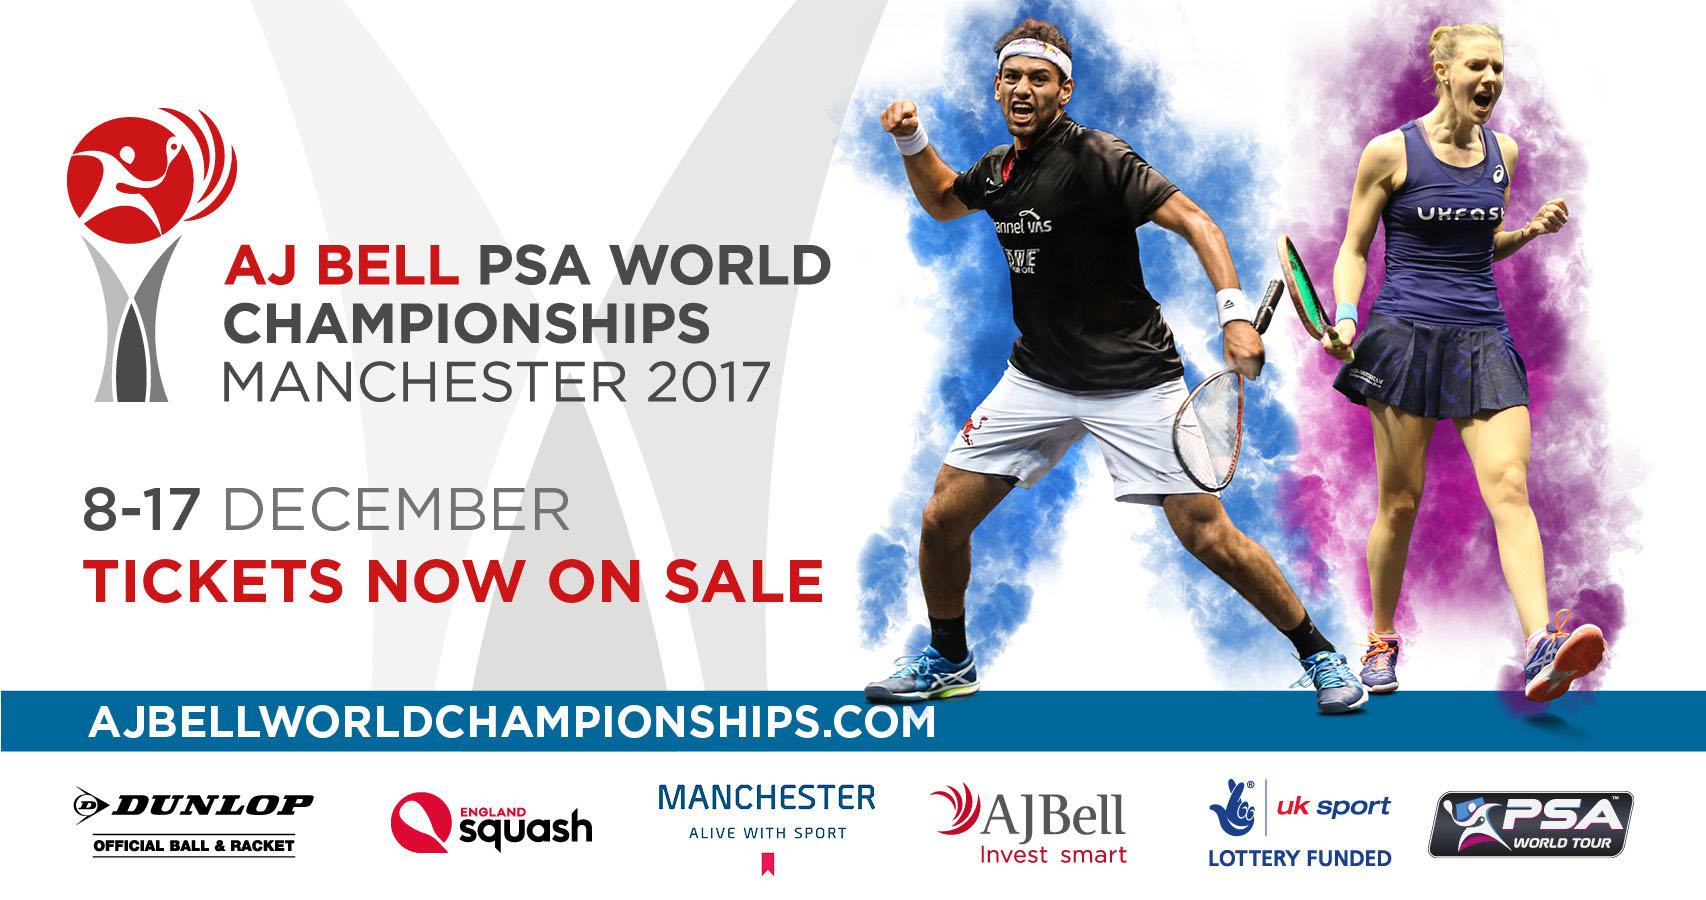 AJ Bell PSA World Championships